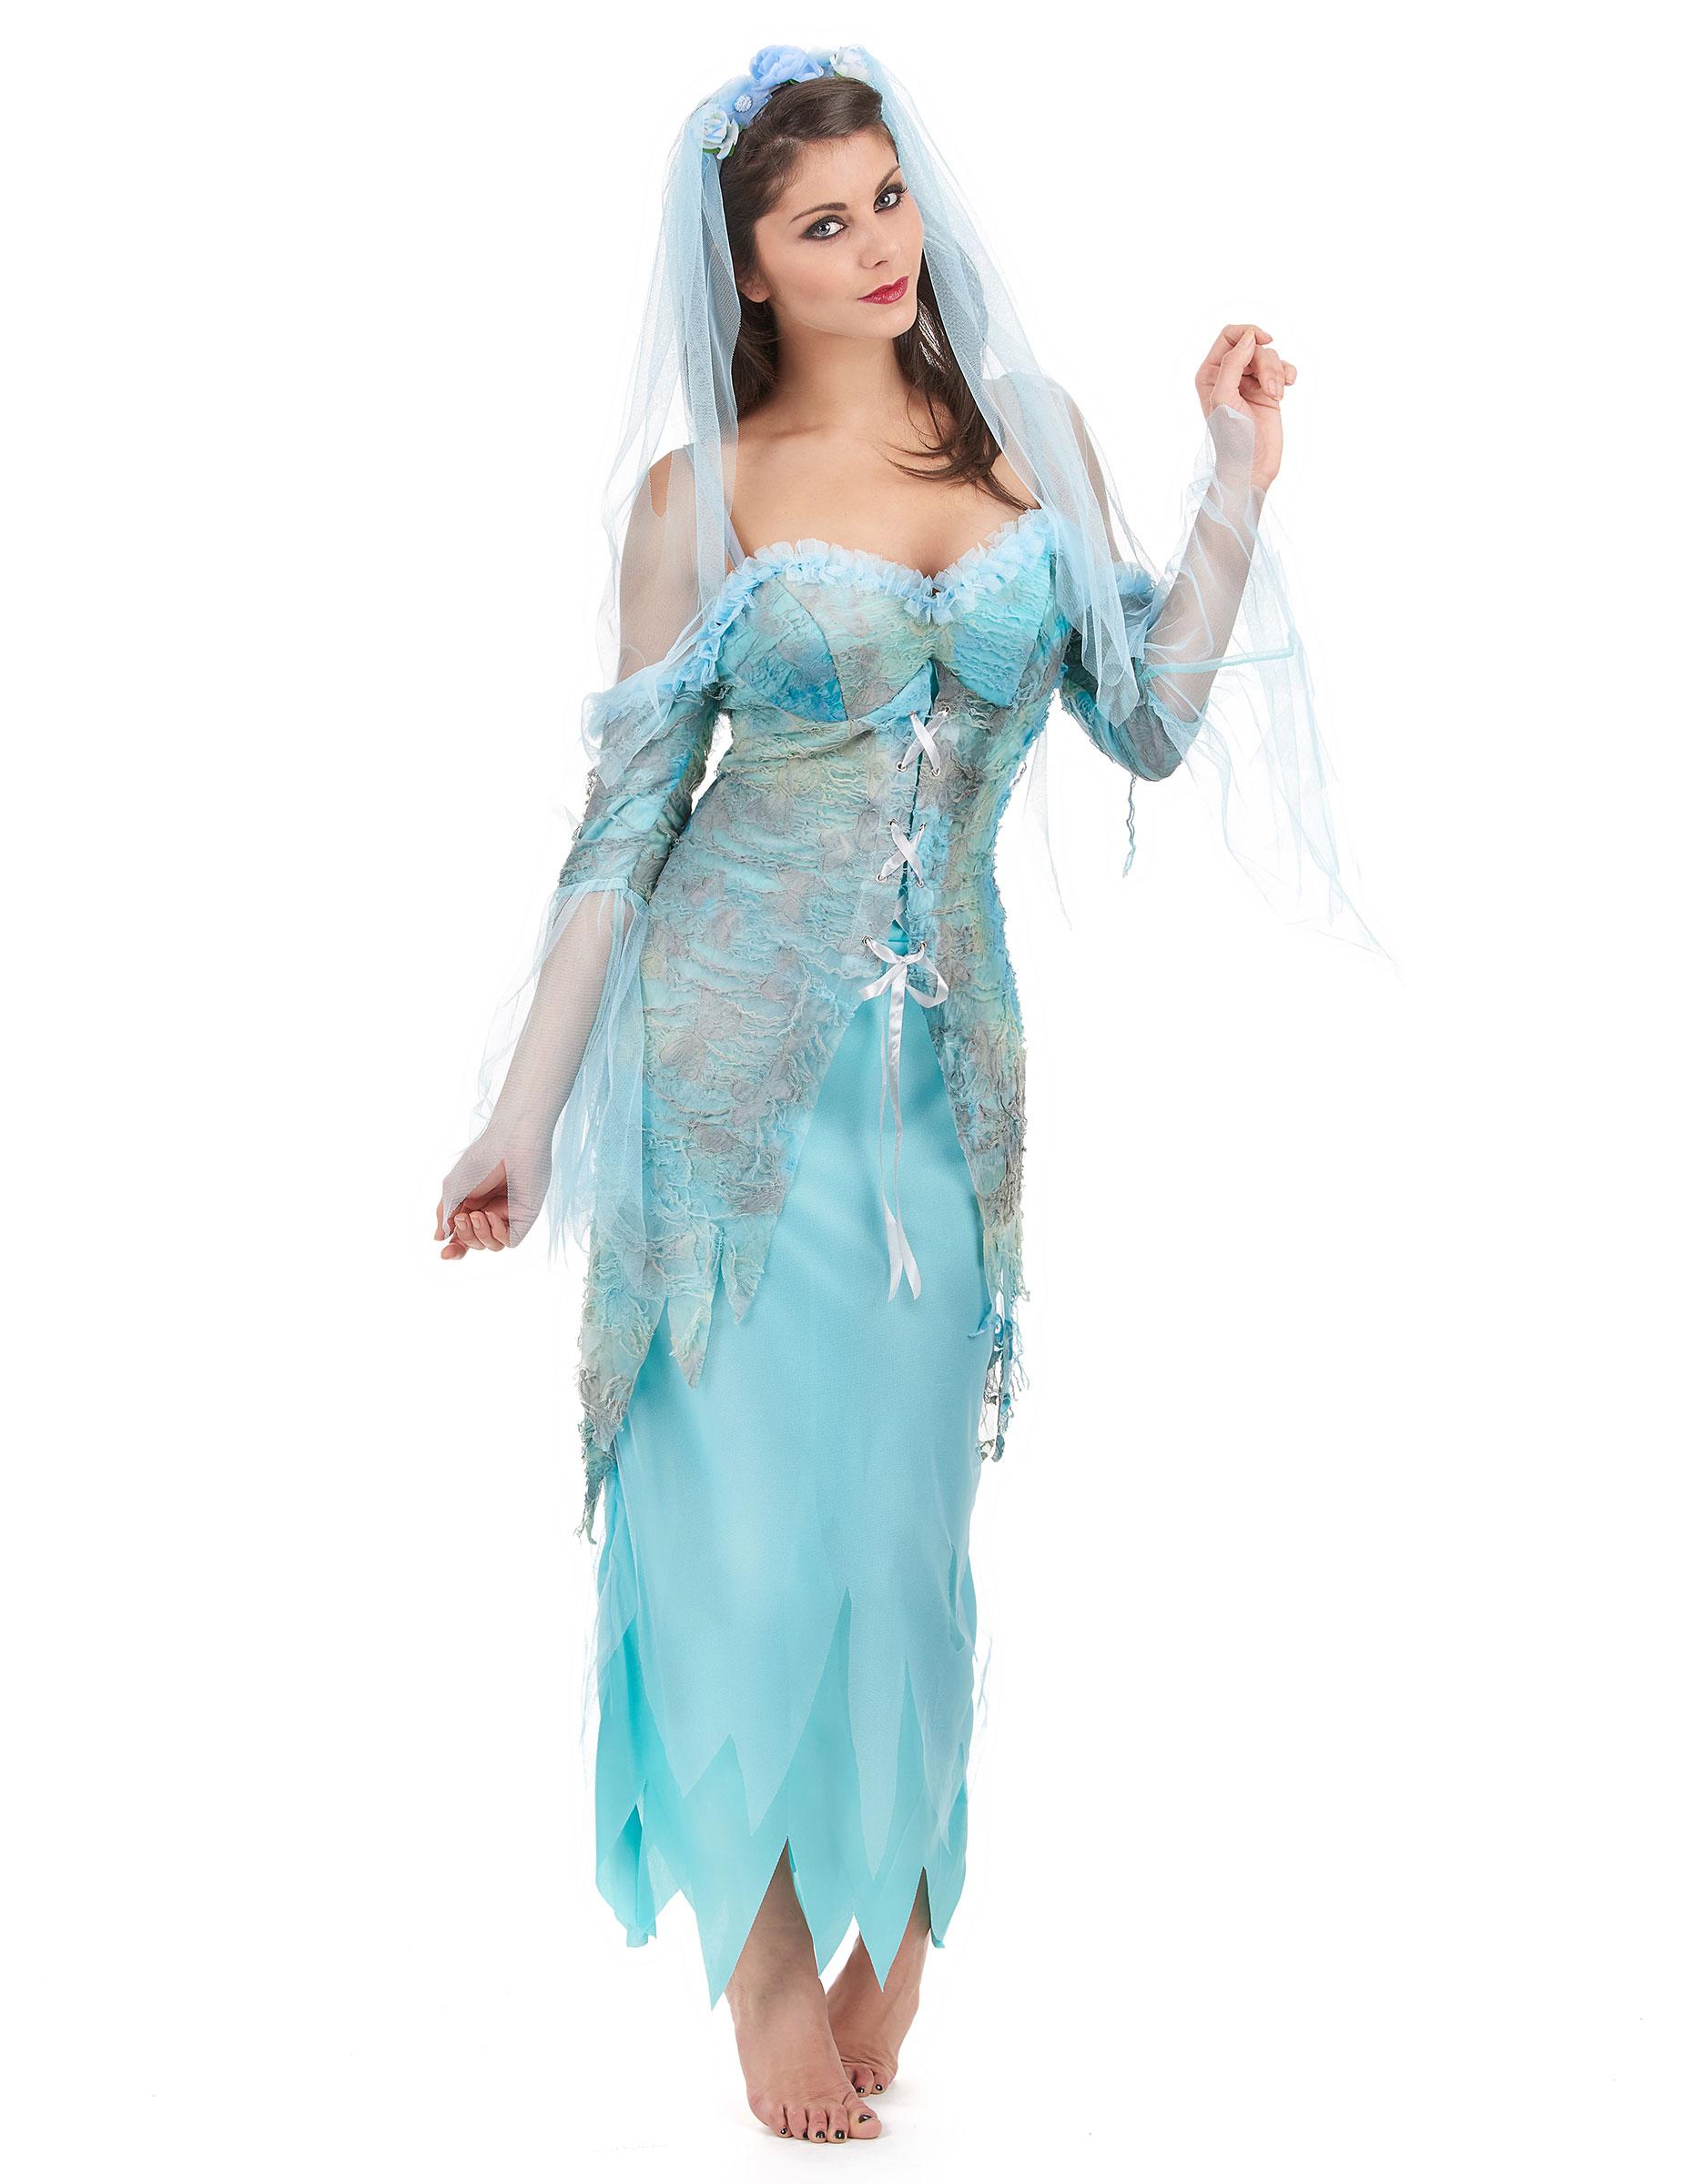 Wasser Fee Damenkostum Nixe Blau Grau Gunstige Faschings Kostume